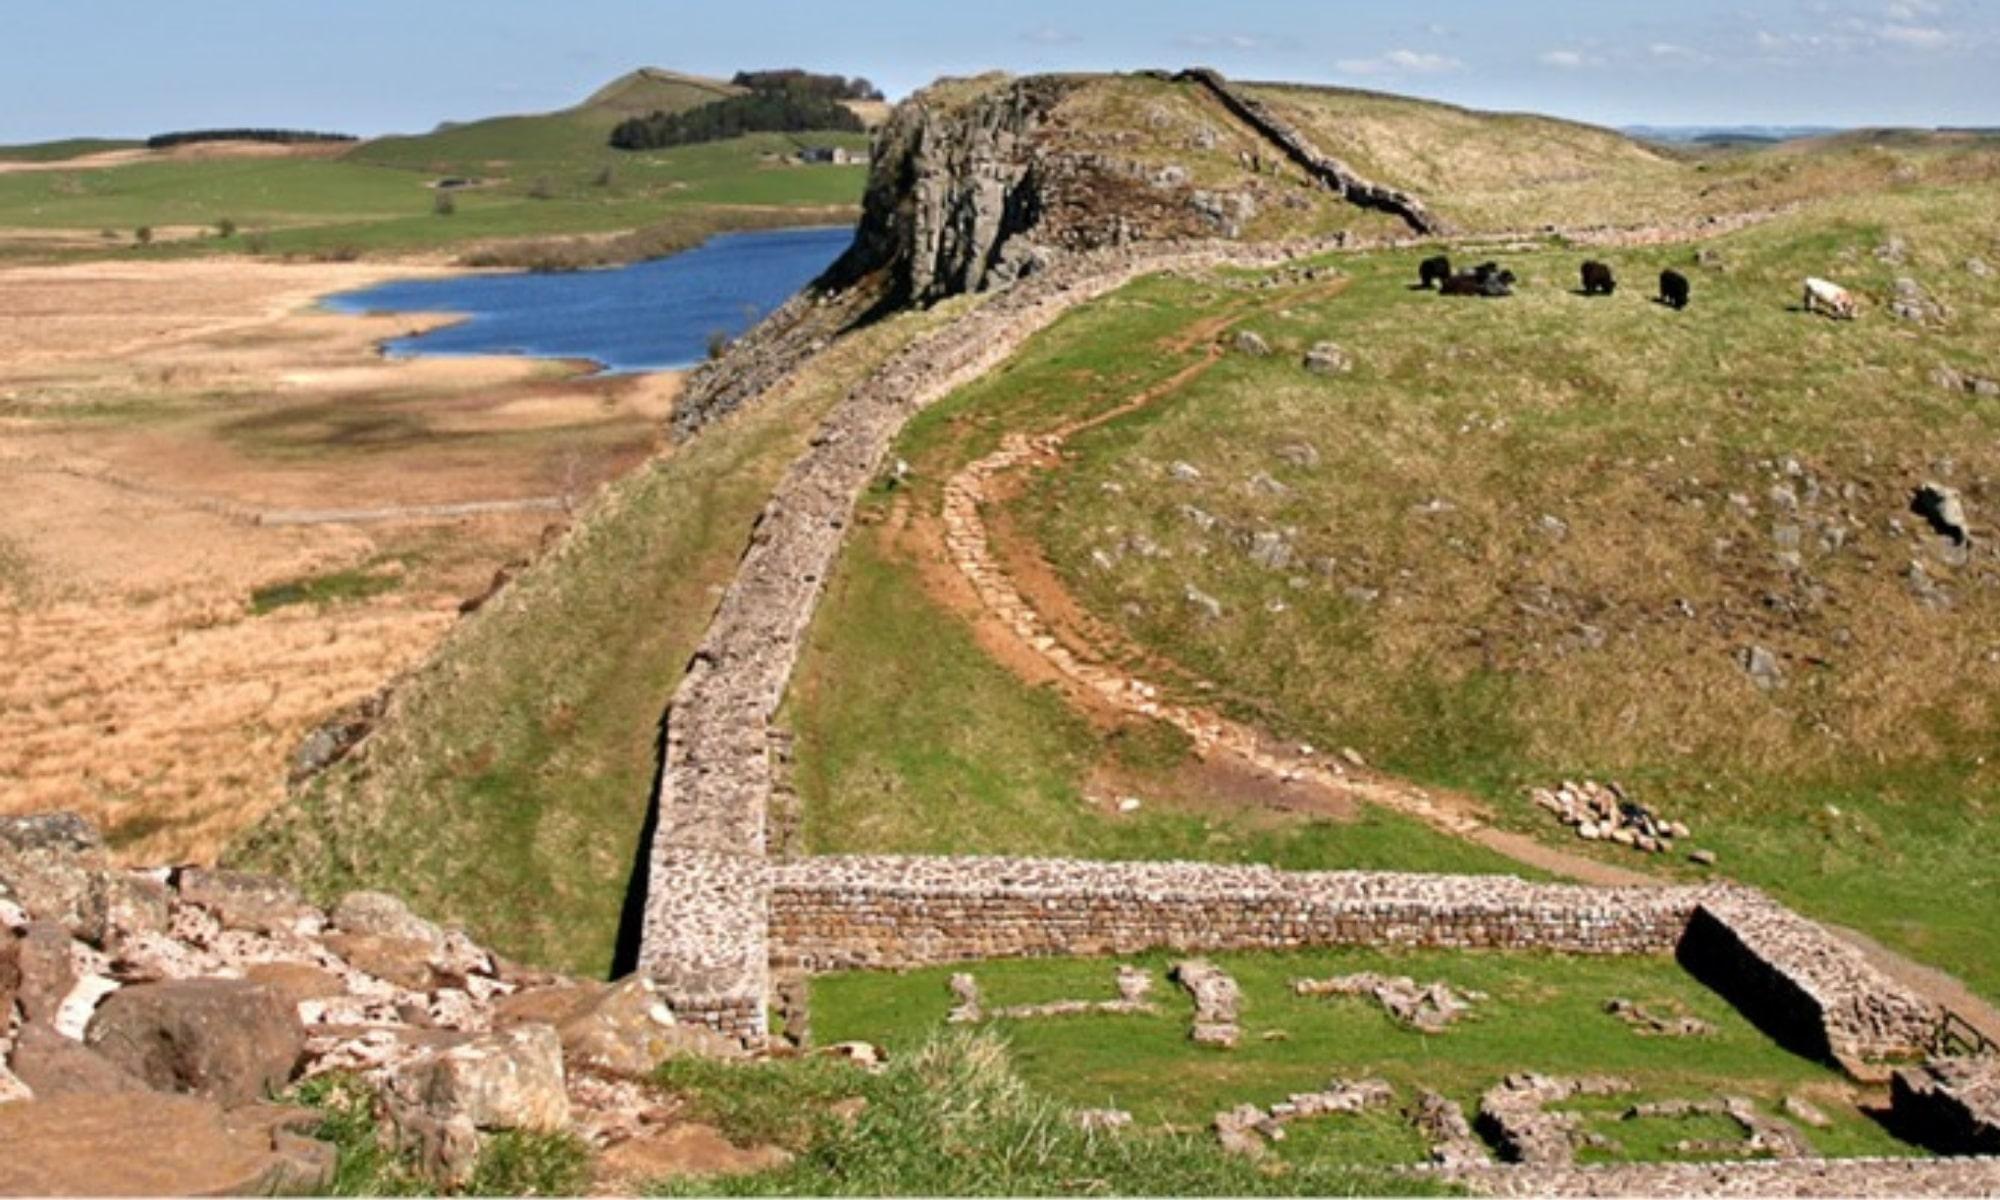 Hadrian's Wall Trek News Post - The Hibbs Lupus Trust